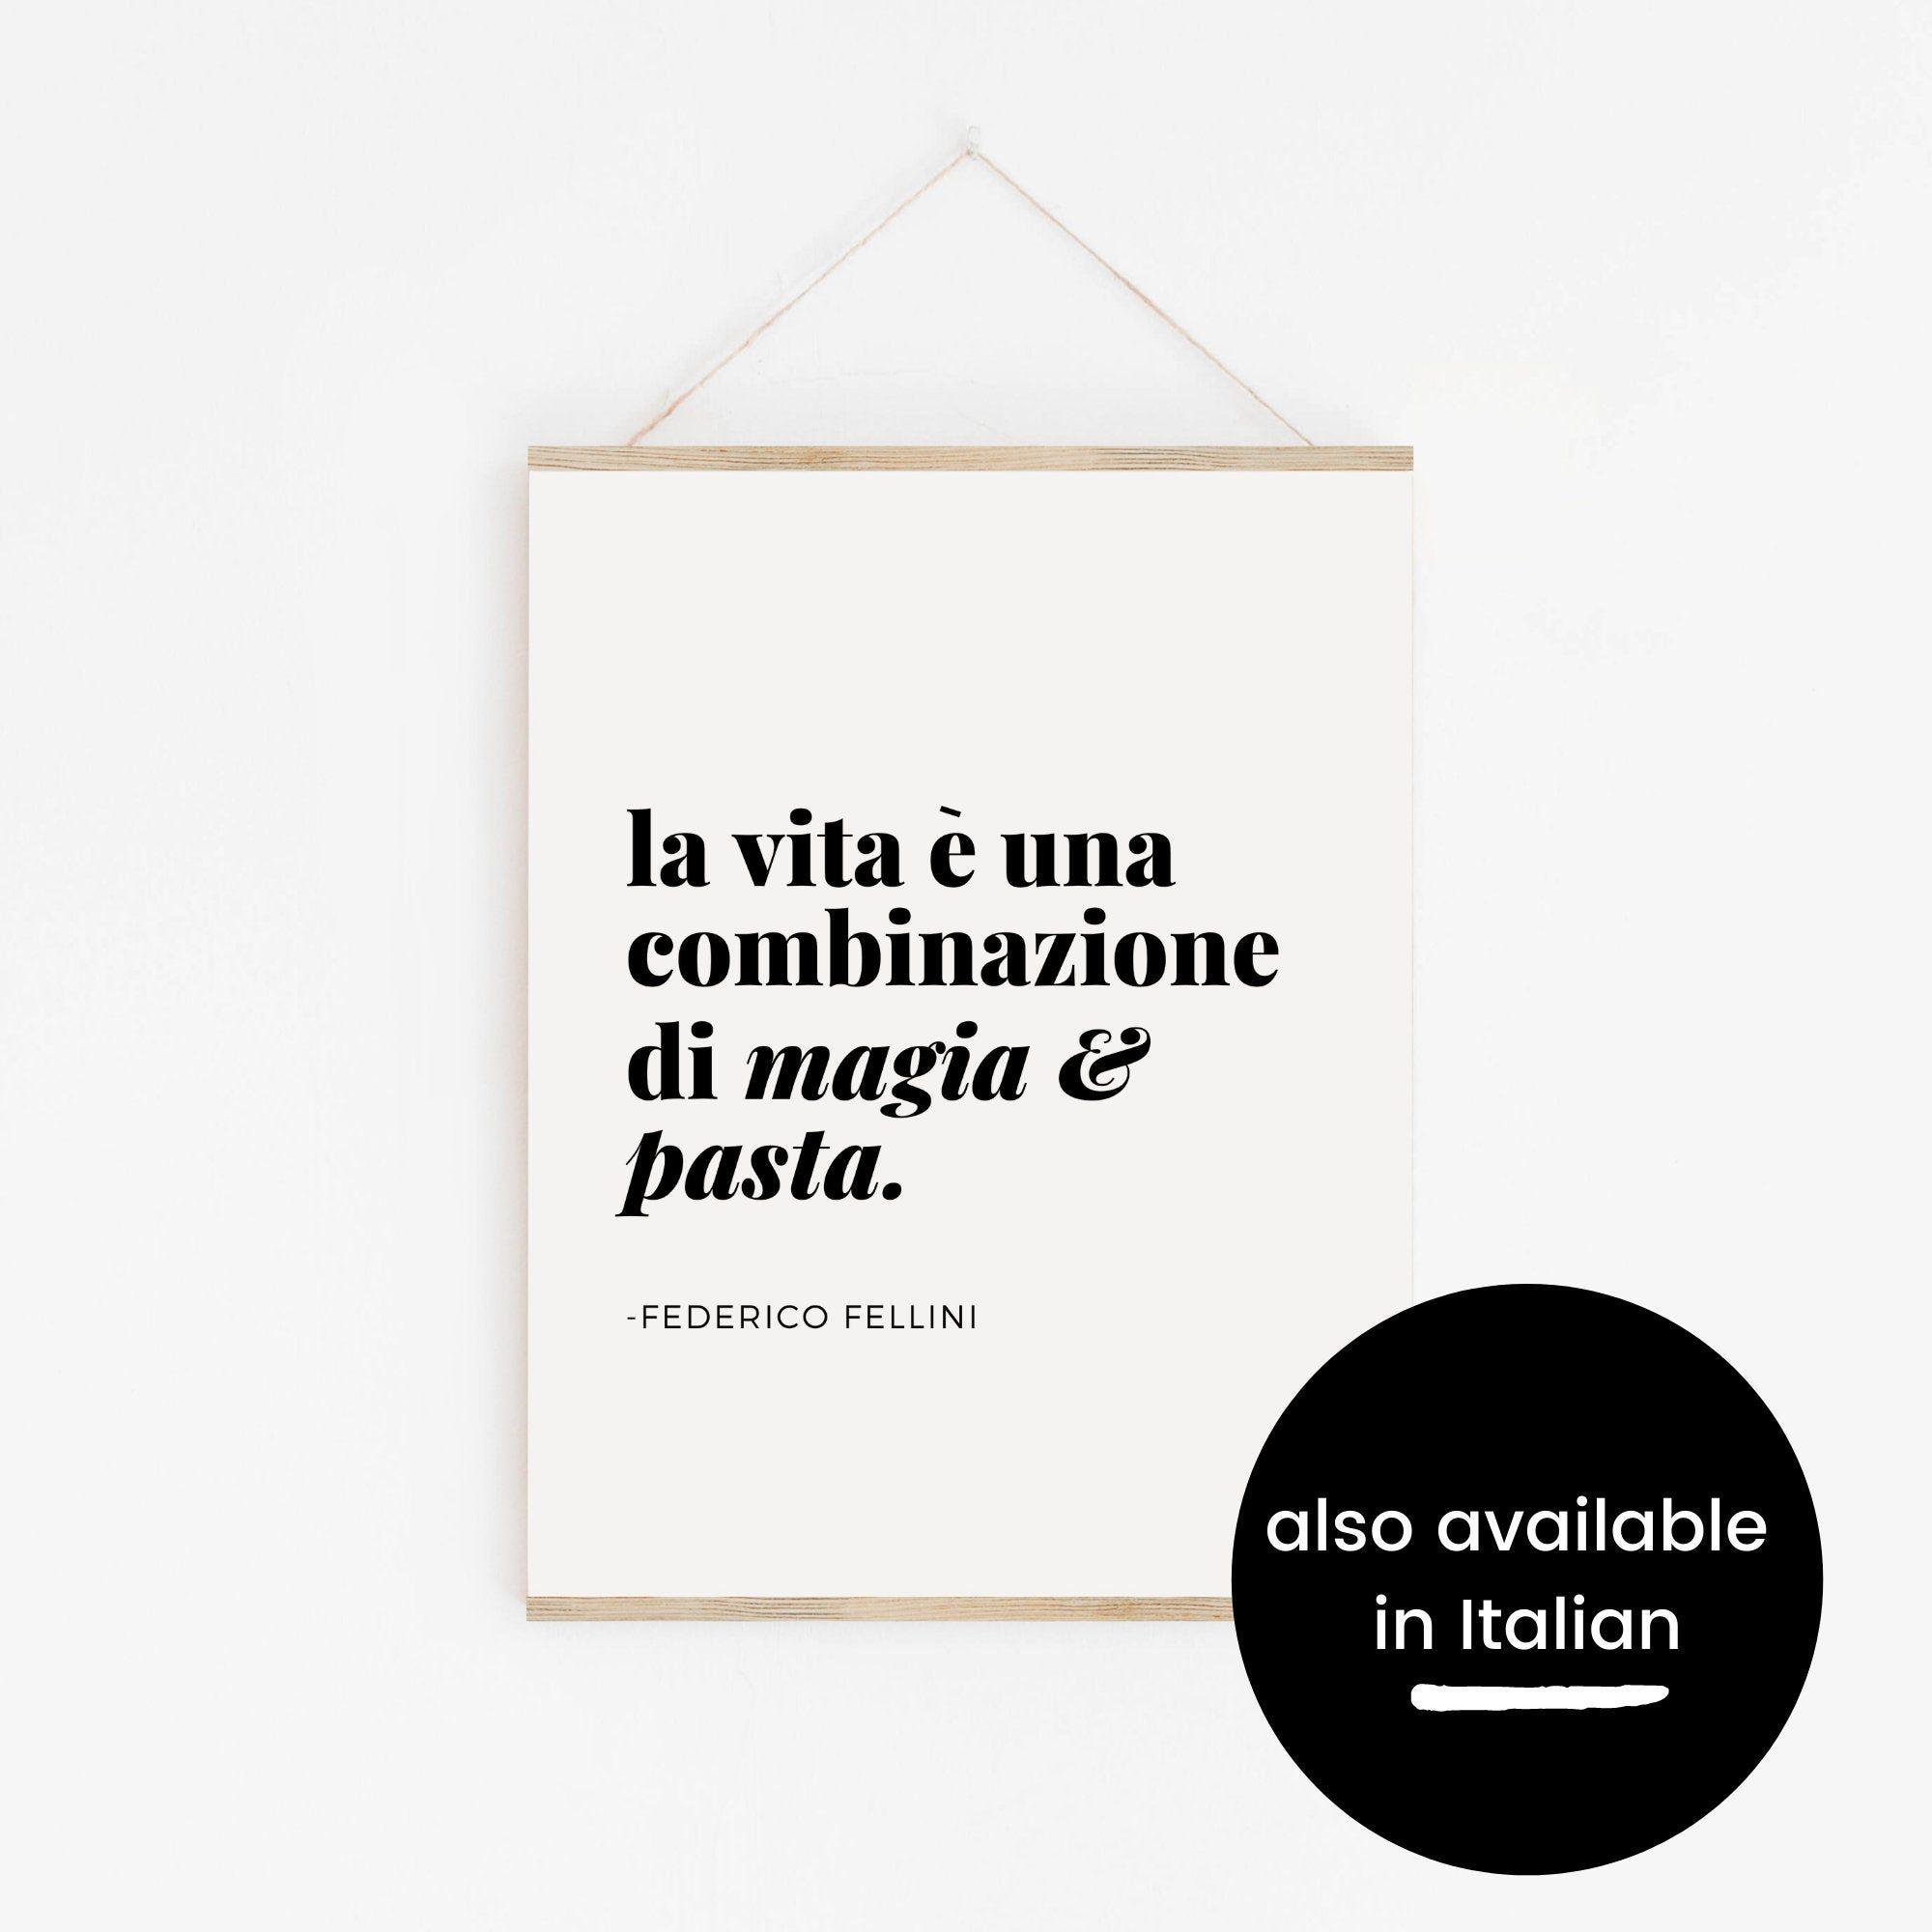 Magic & Pasta Art Print in English - Fellini Quote Art Print - Italy Lovers Gifts - Italian Language Quotes